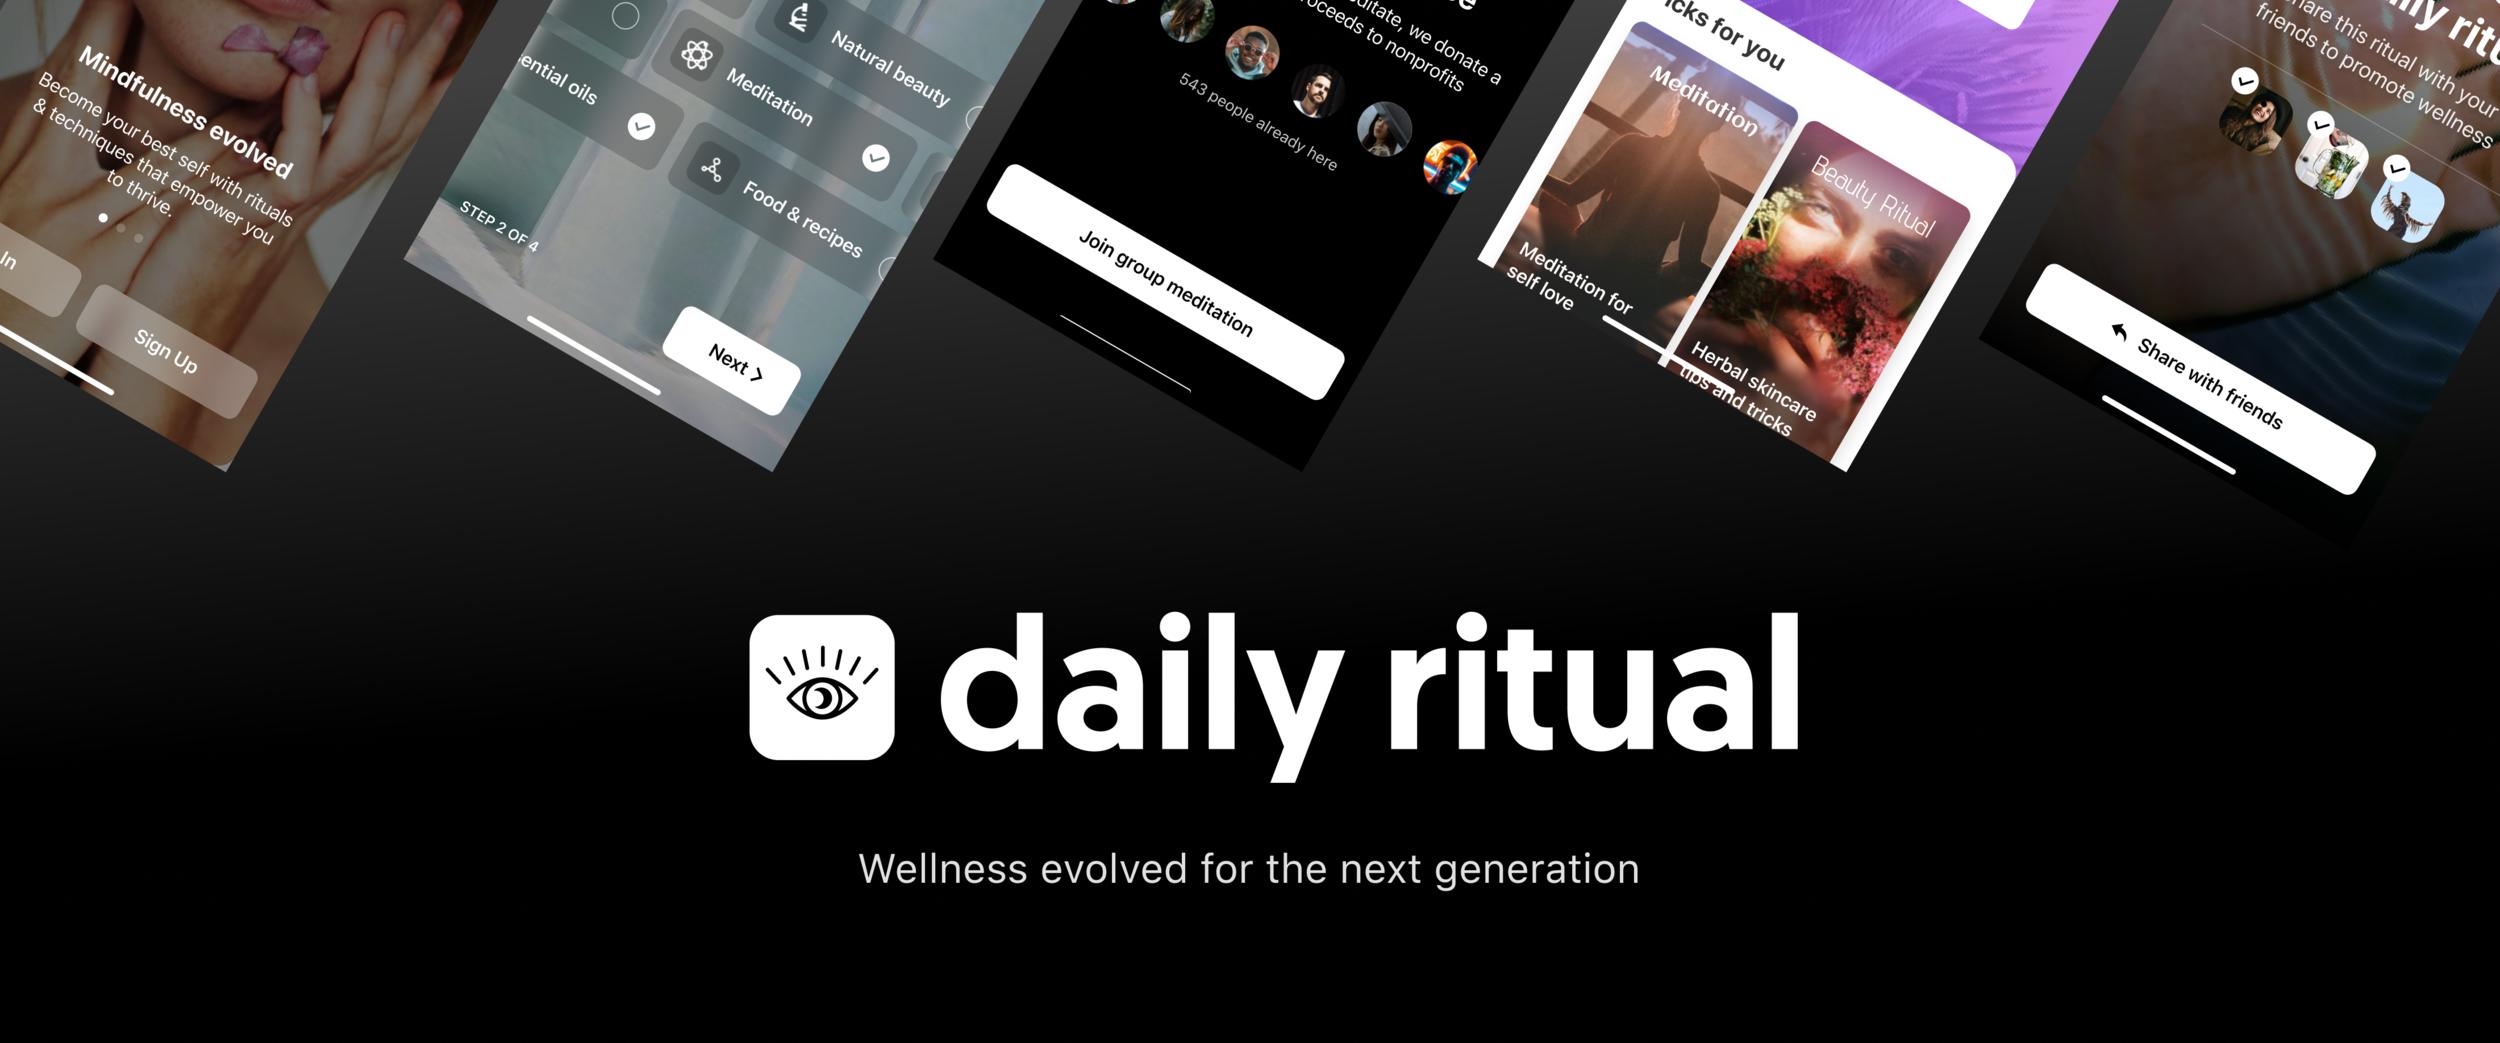 Daily Ritual.png